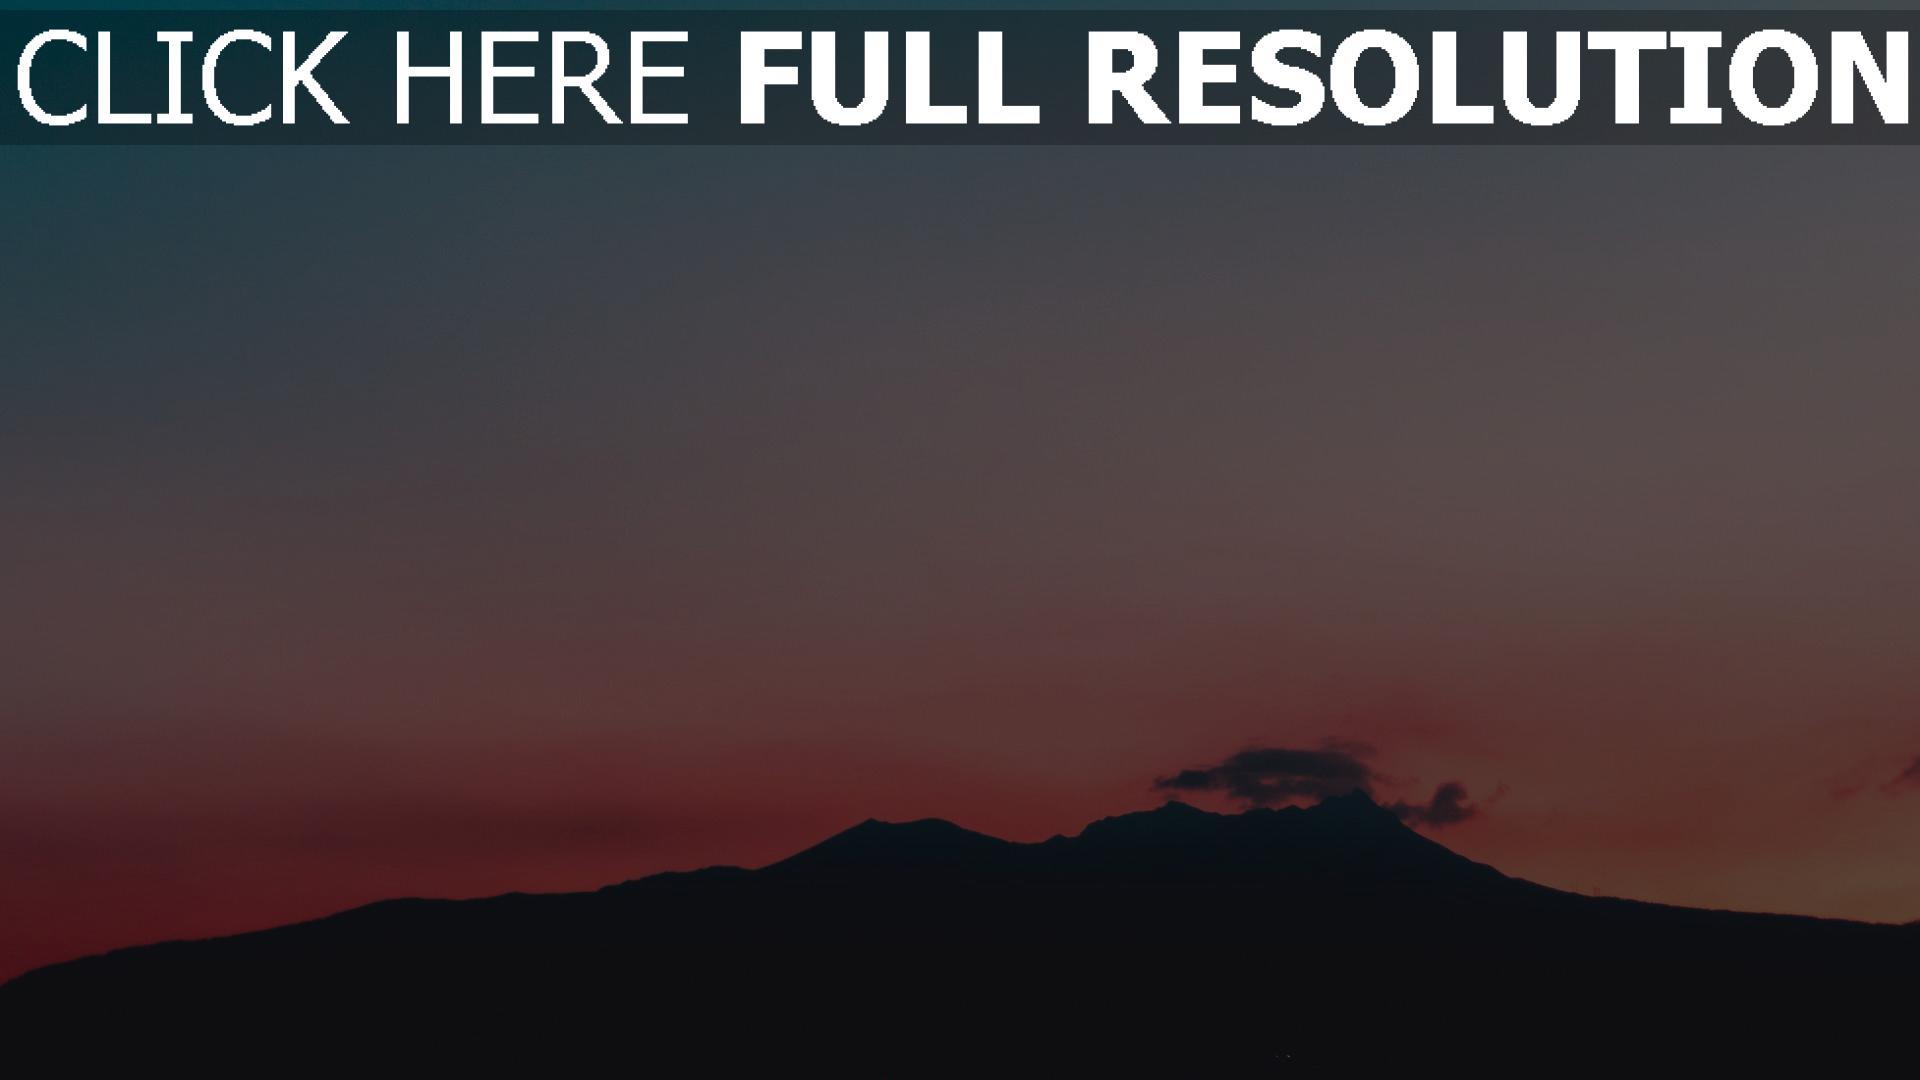 HD Hintergrundbilder sonnenuntergang berge himmel, desktop ...